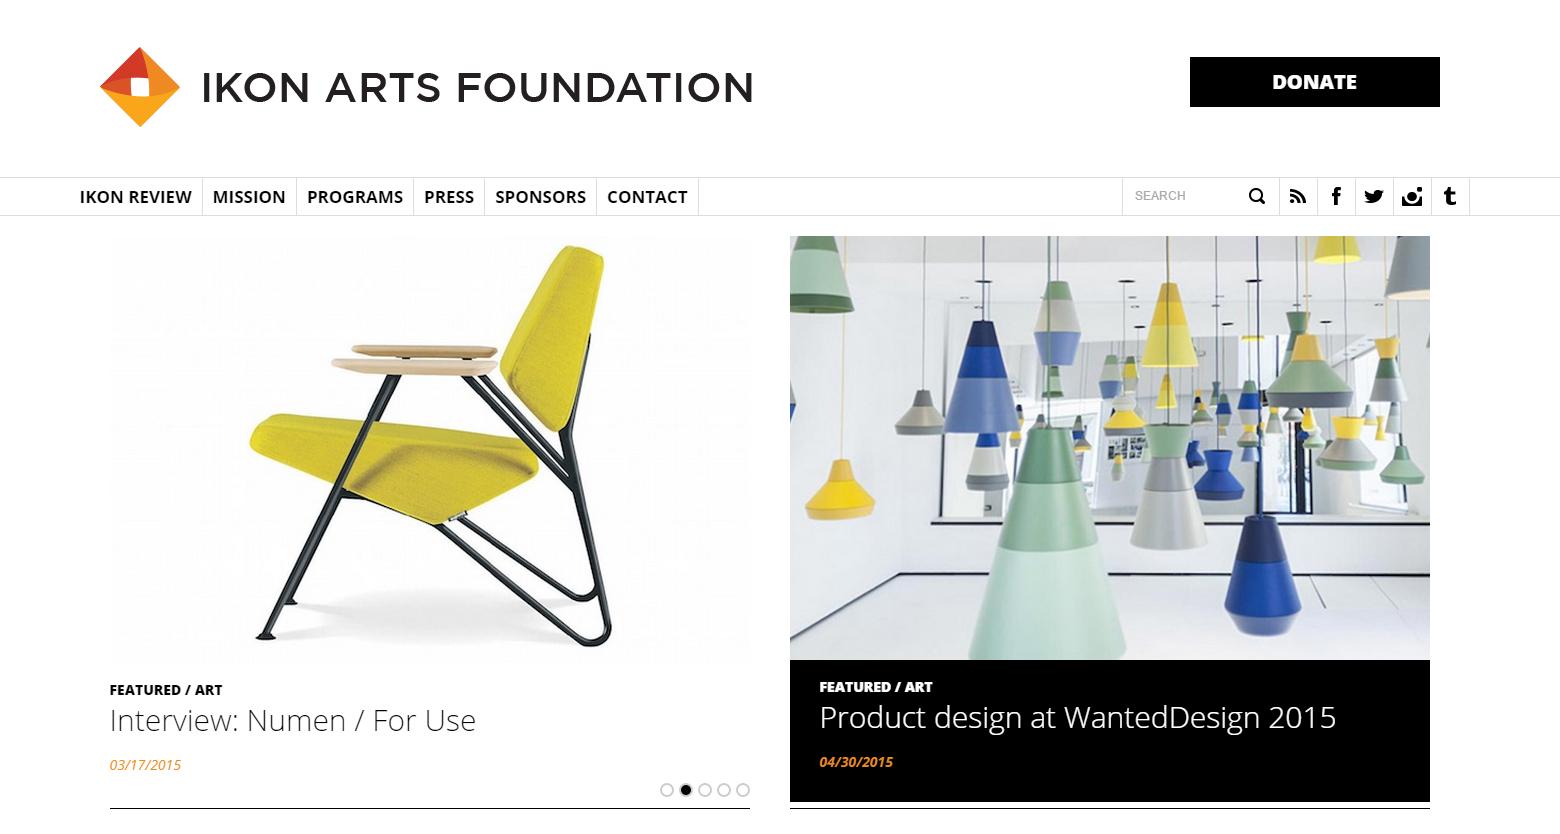 ikon art foundation home